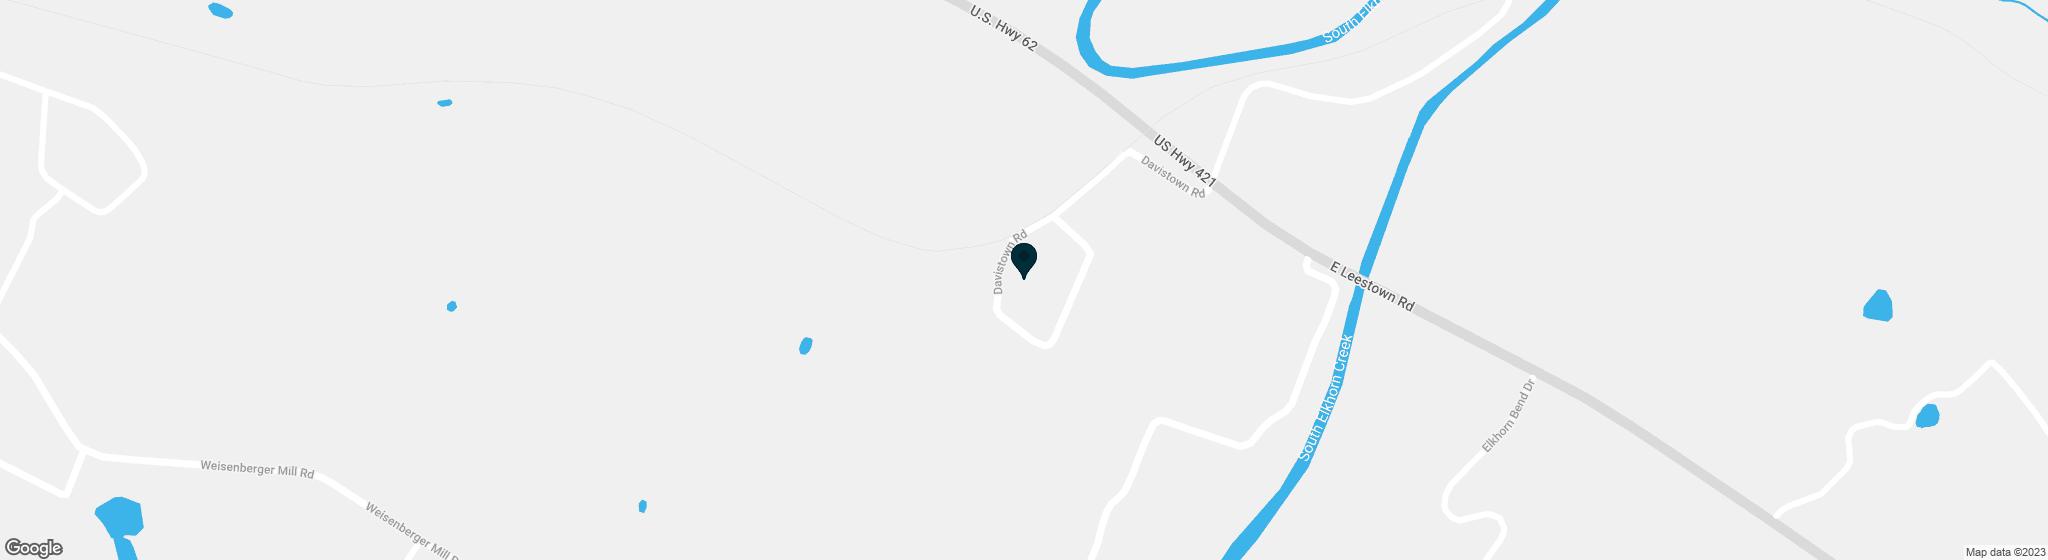 330 Davistown Road Midway KY 40347